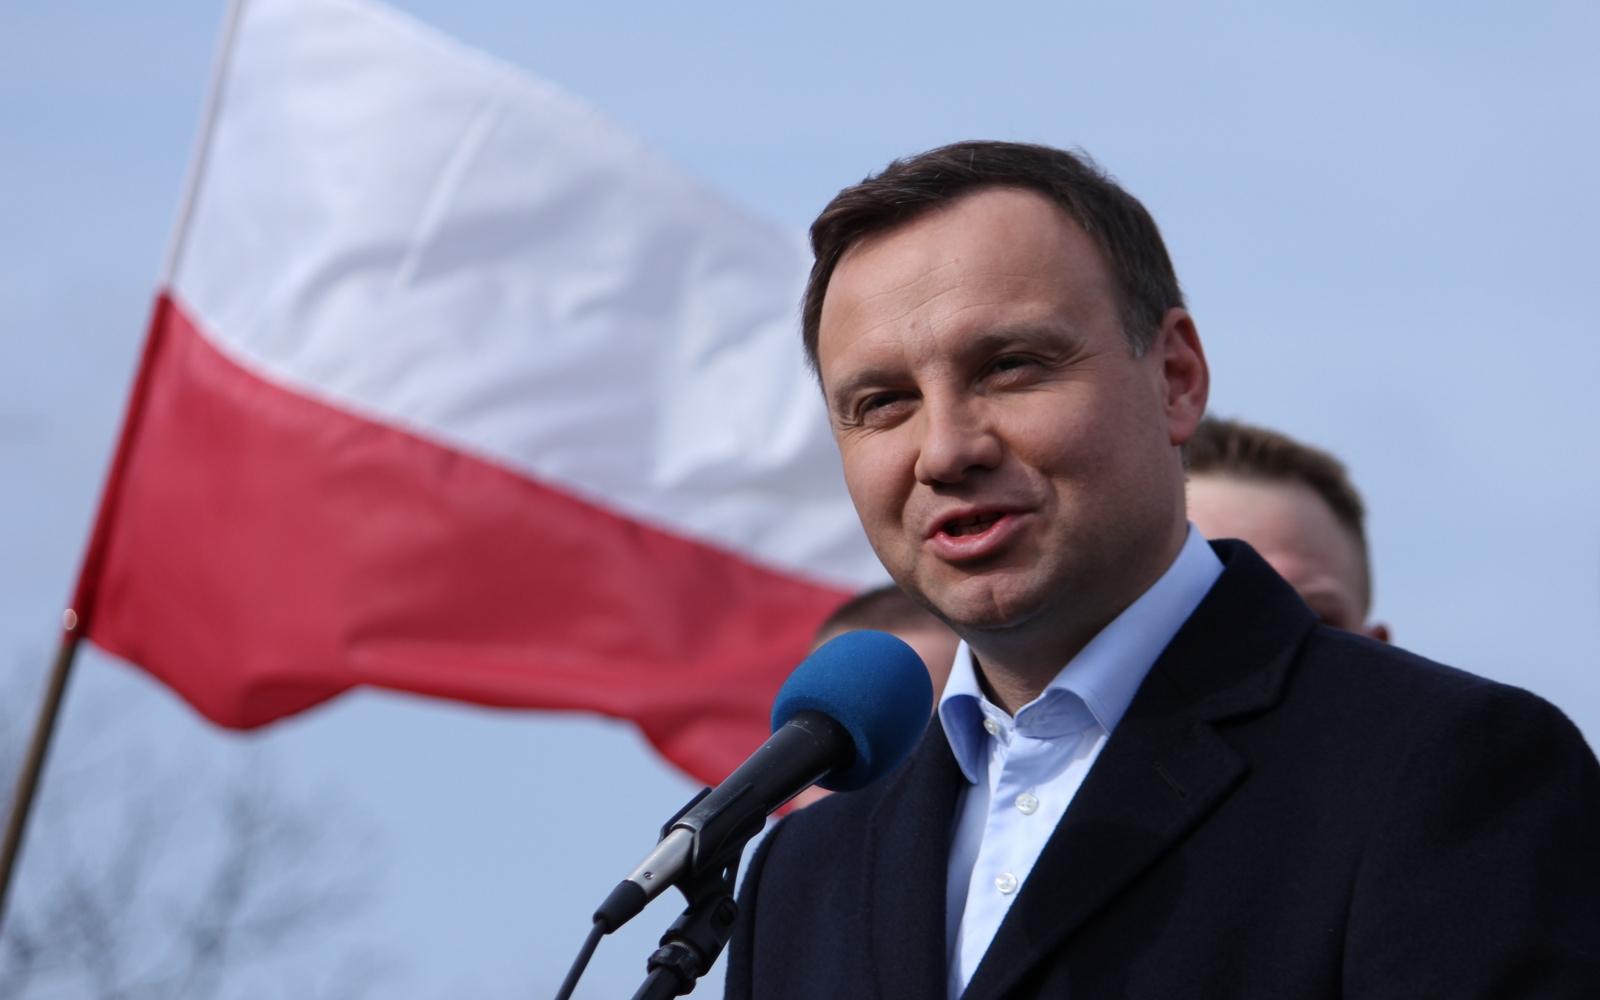 PAN PREZYDENT DUDACZEWSKI